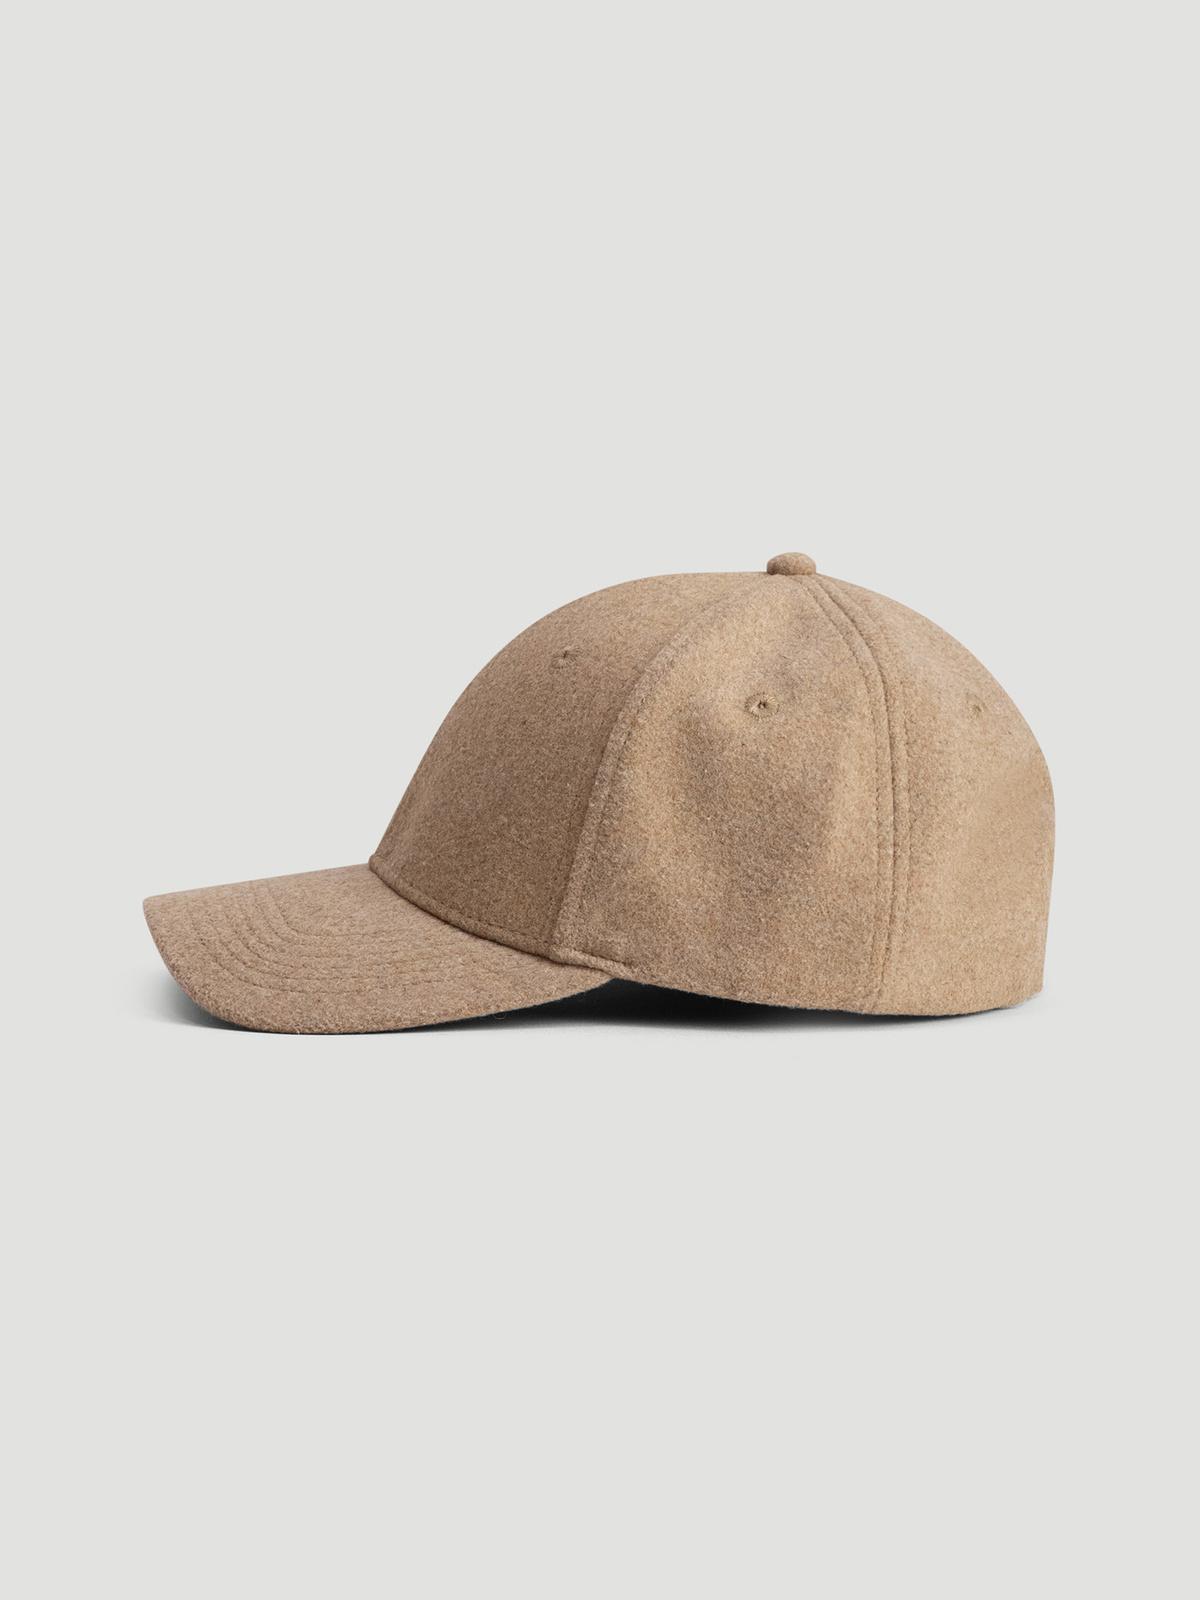 Holzweiler Wool Caps  Beige 0